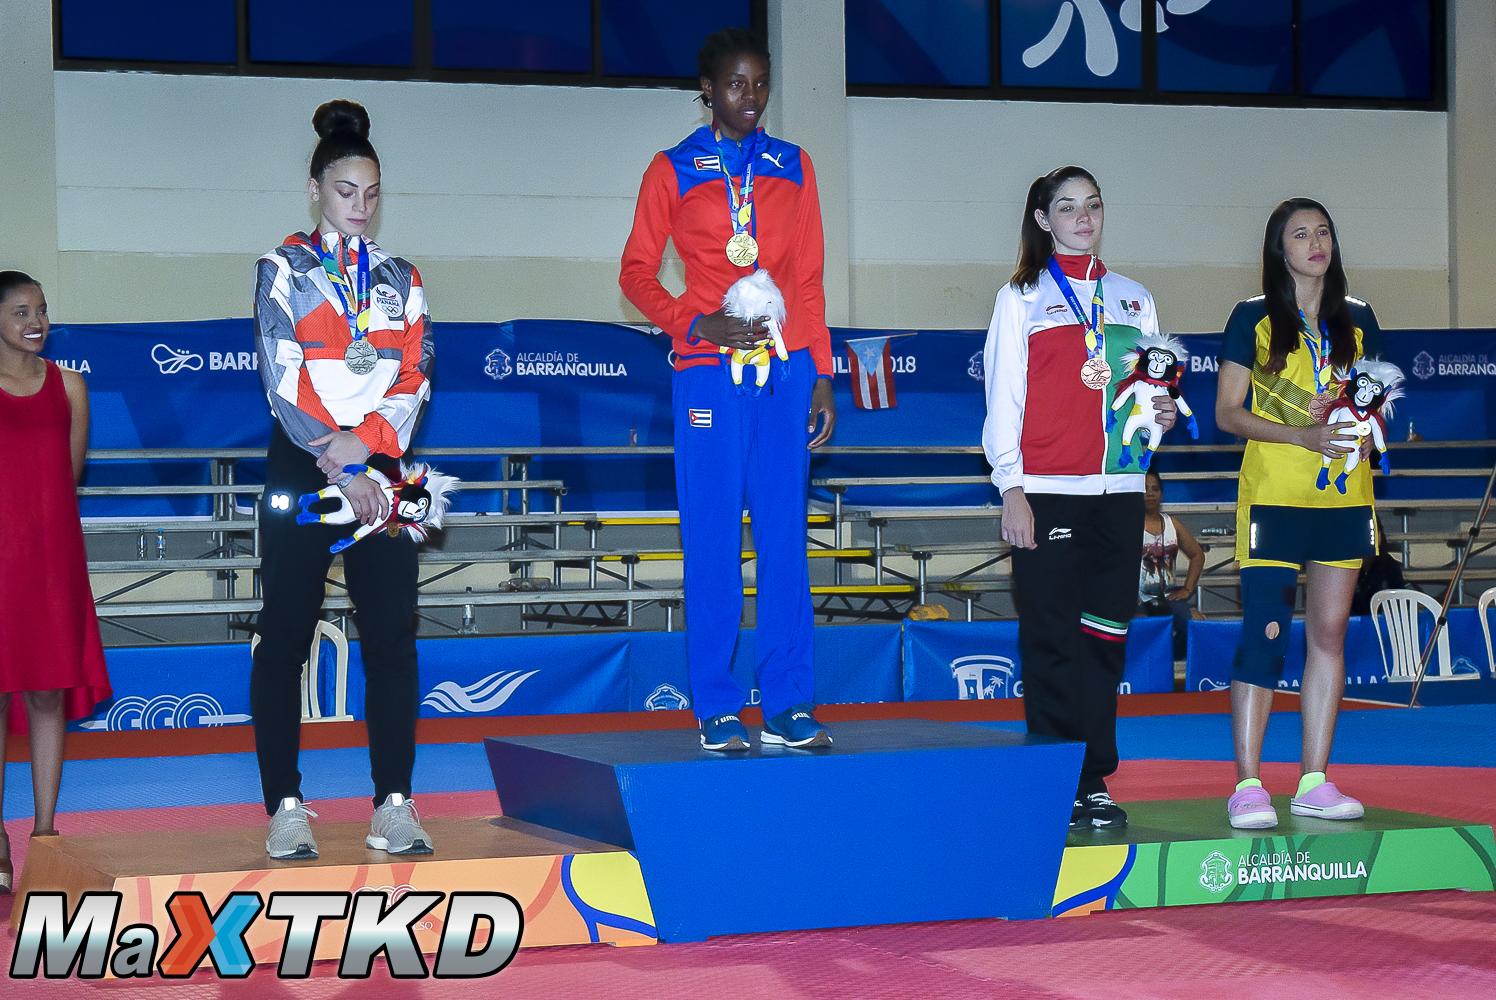 20180720_JCAC-Barranquilla2018_podio-Femenino-53